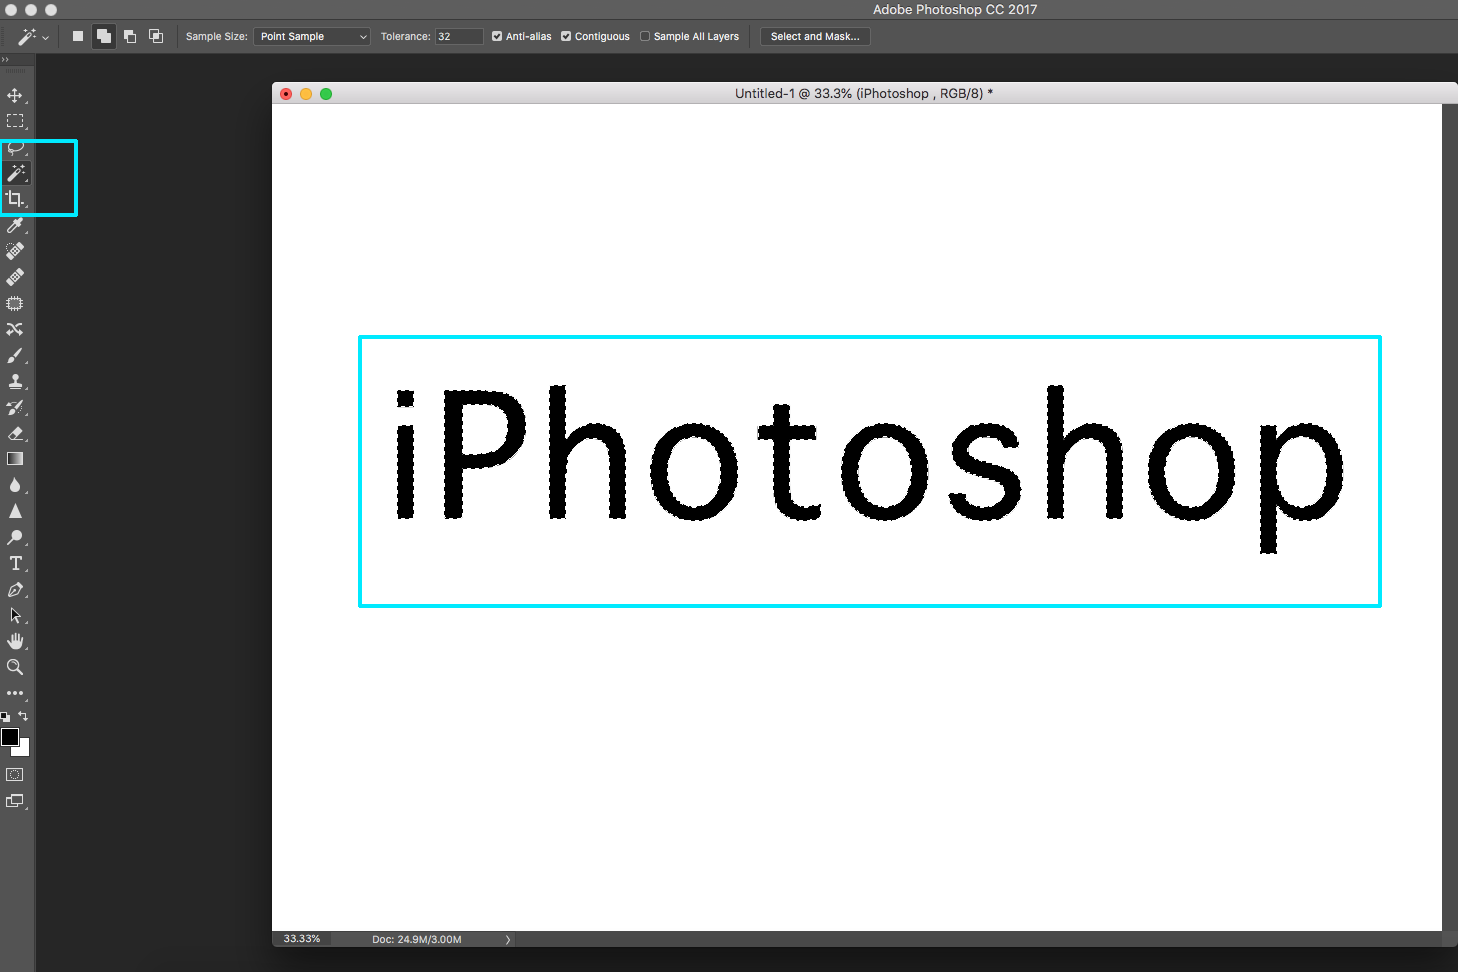 photoshop iphotoshop screenshot logo watermark signature